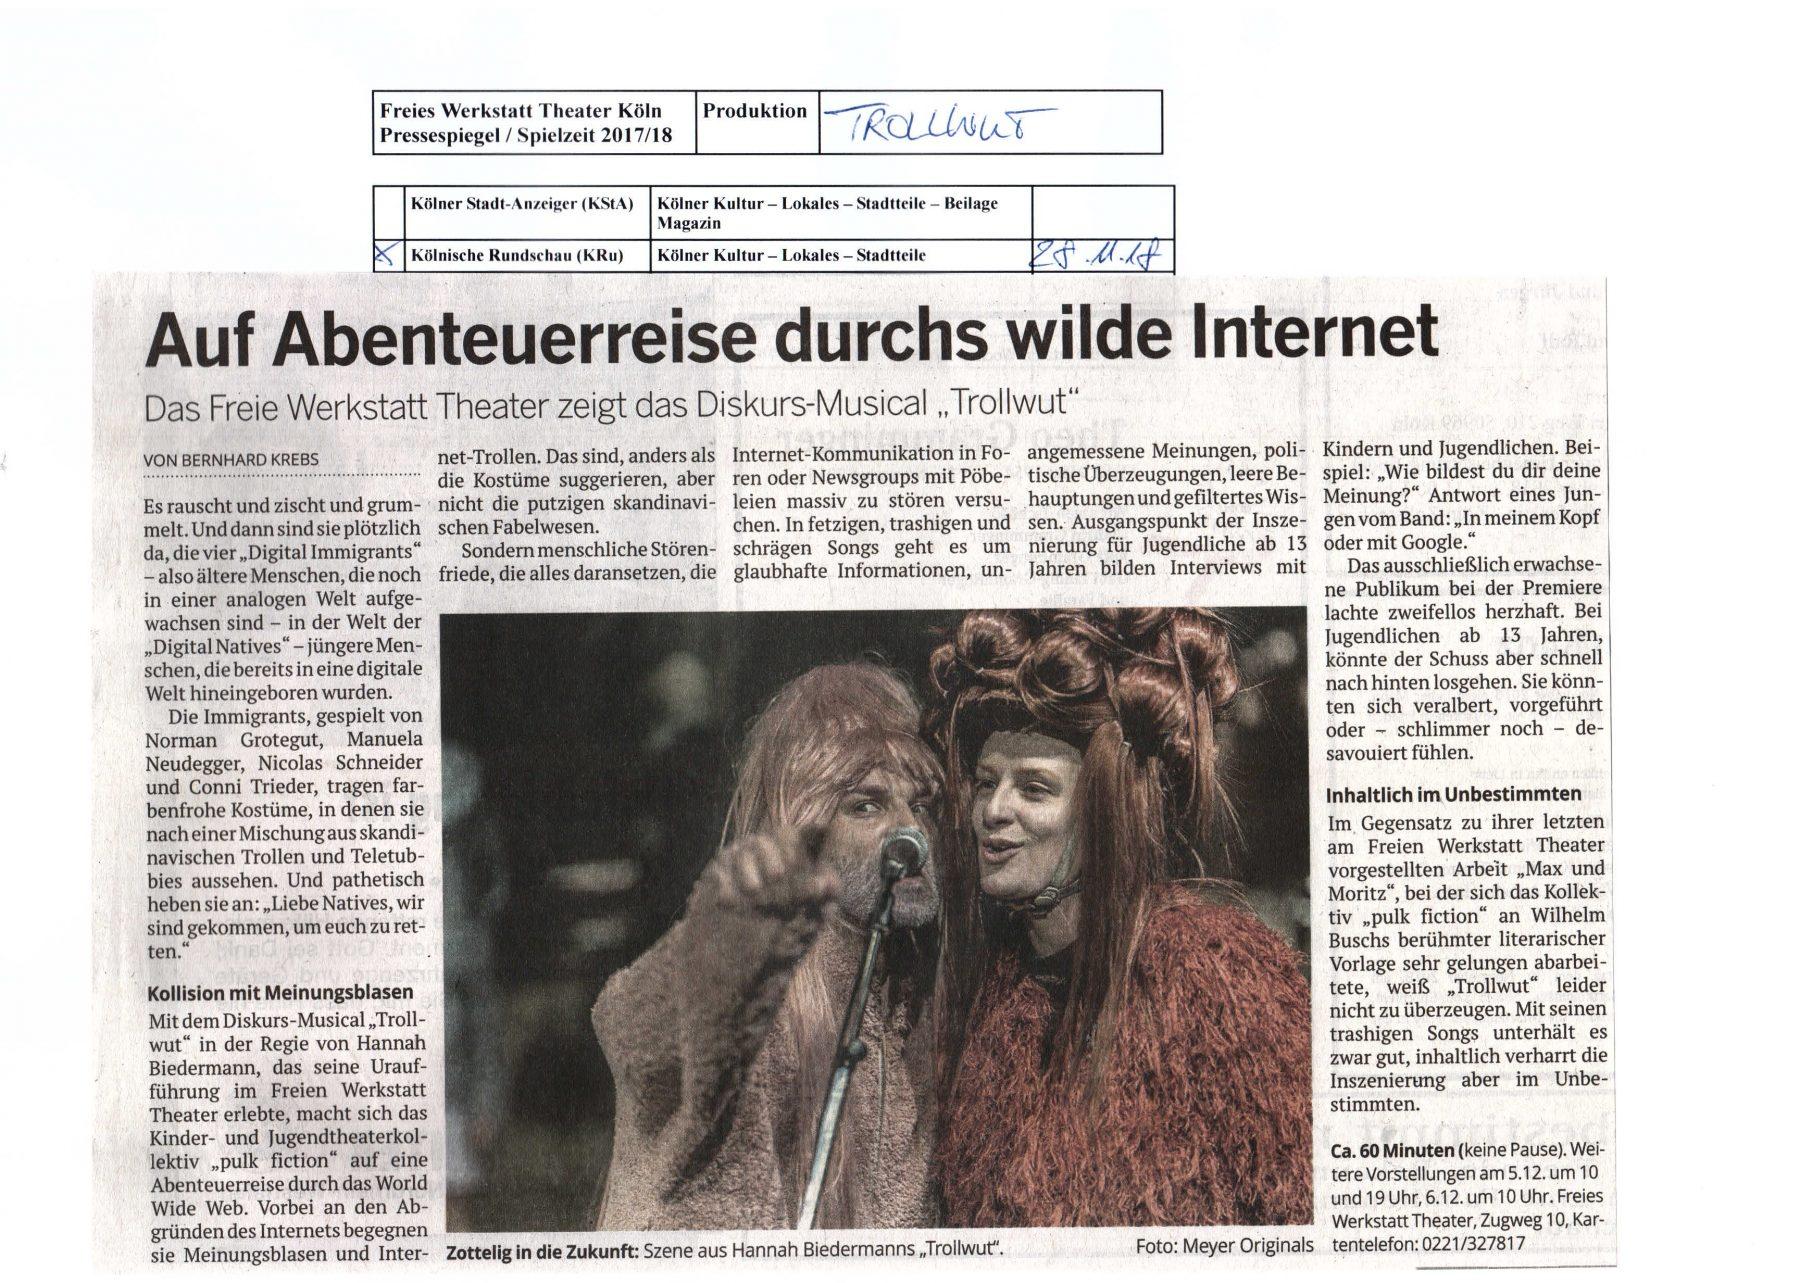 Trollwut_Kölnische Rundschau_28.11.2018